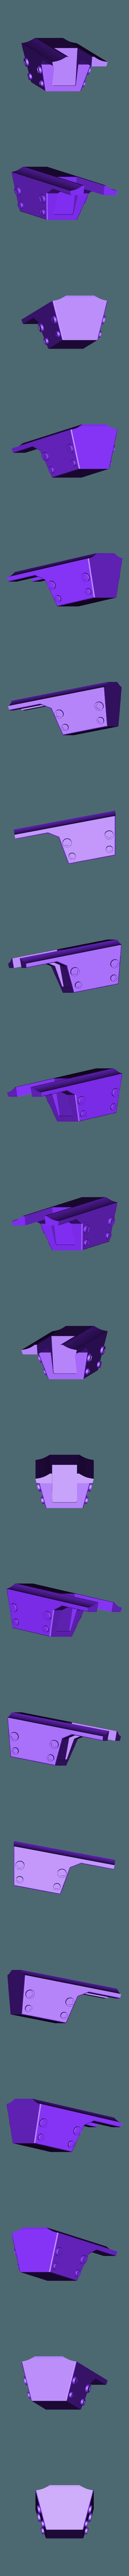 Under_Barrell.stl Télécharger fichier STL gratuit Borderlands Bandit Room Clener Shotgun • Modèle pour impression 3D, Dsk